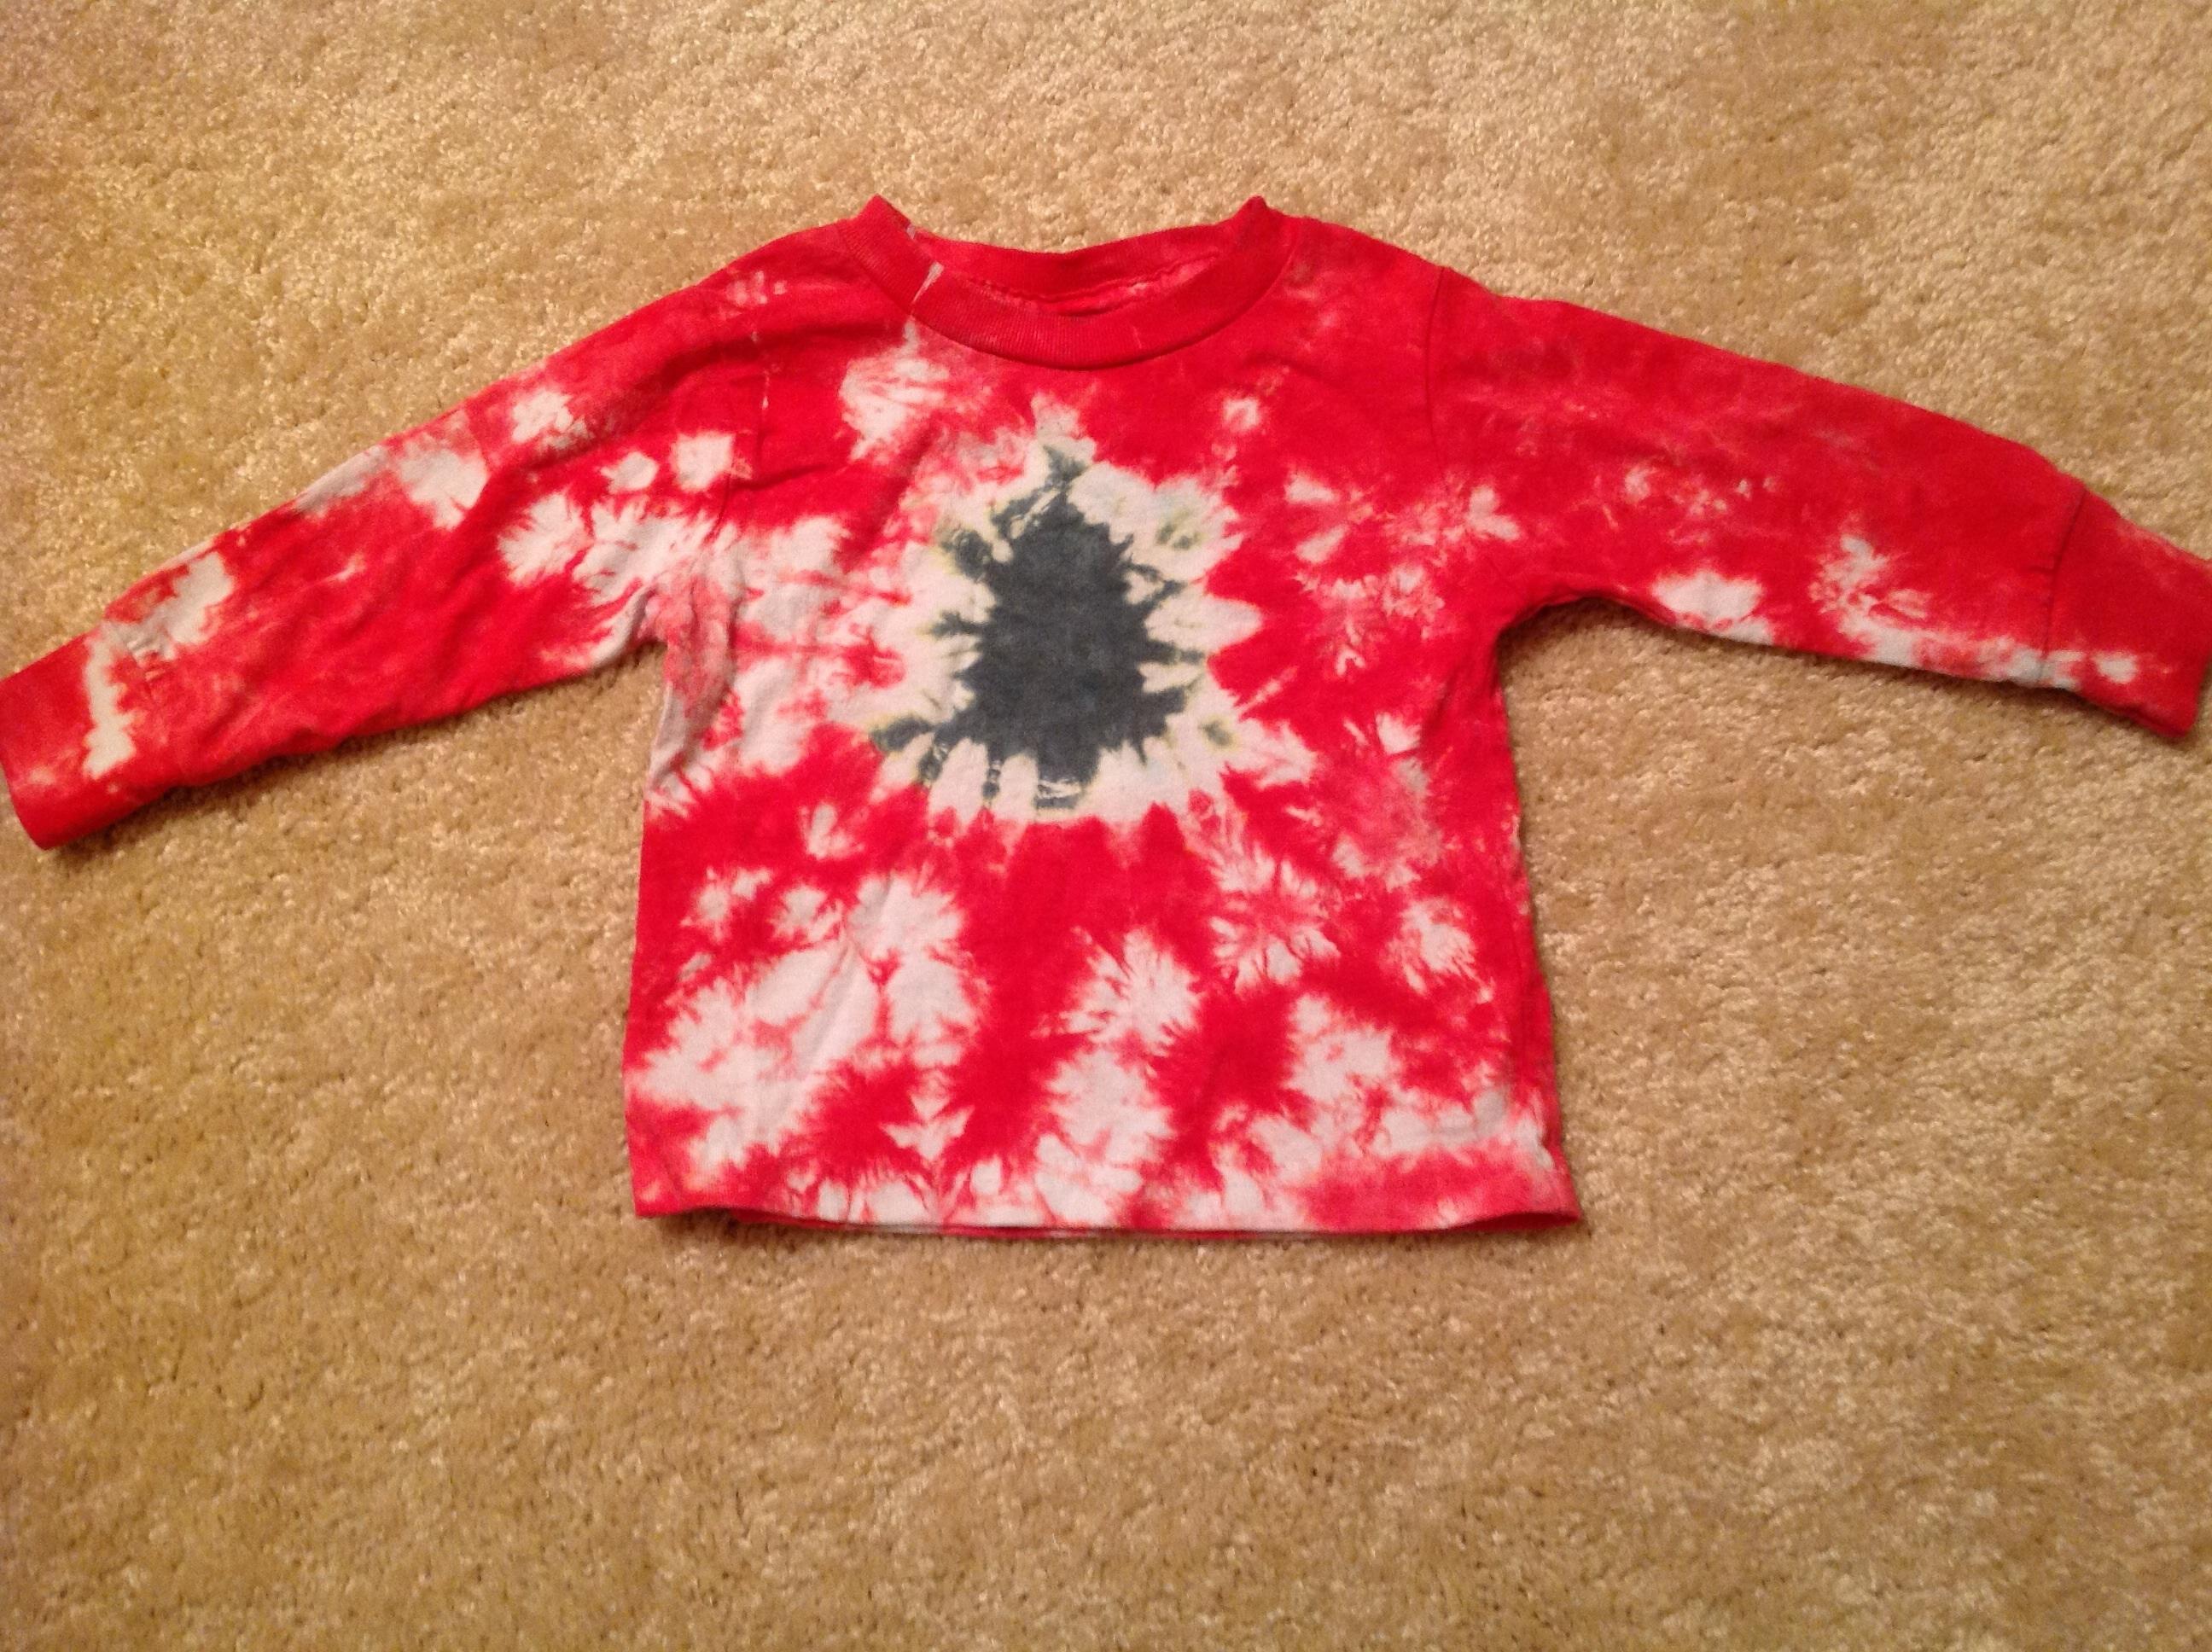 Isis Inspired | 2T long sleeve shirt Christmas tree tie dye | Online ...